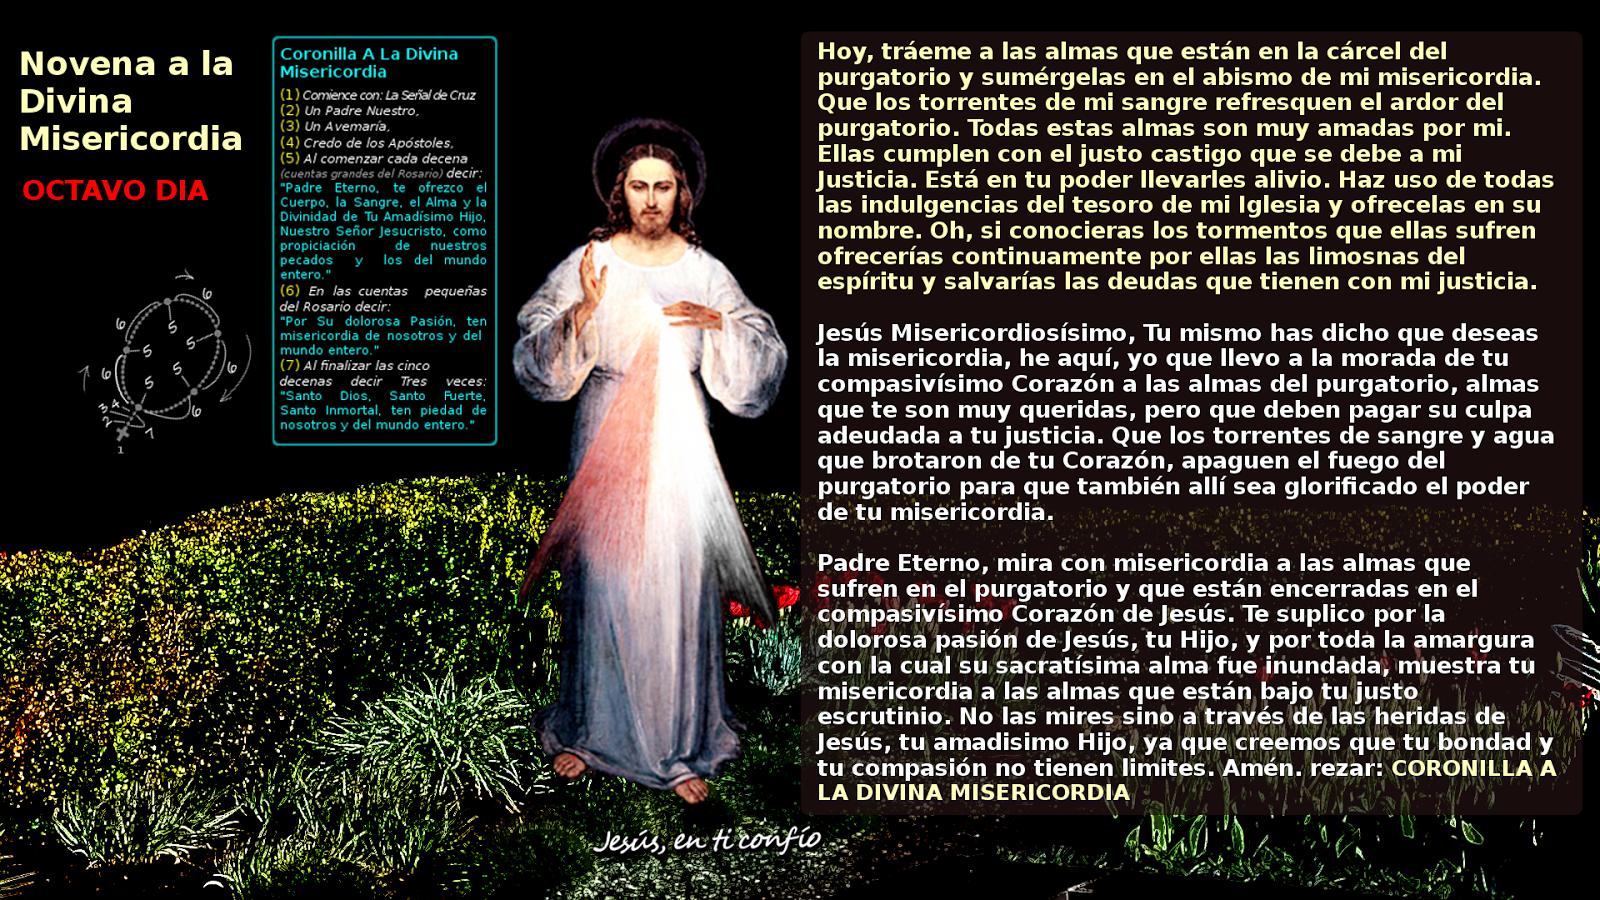 novena divina misericordia  OCTAVO DIA con pedidos de Jesus misericordioso